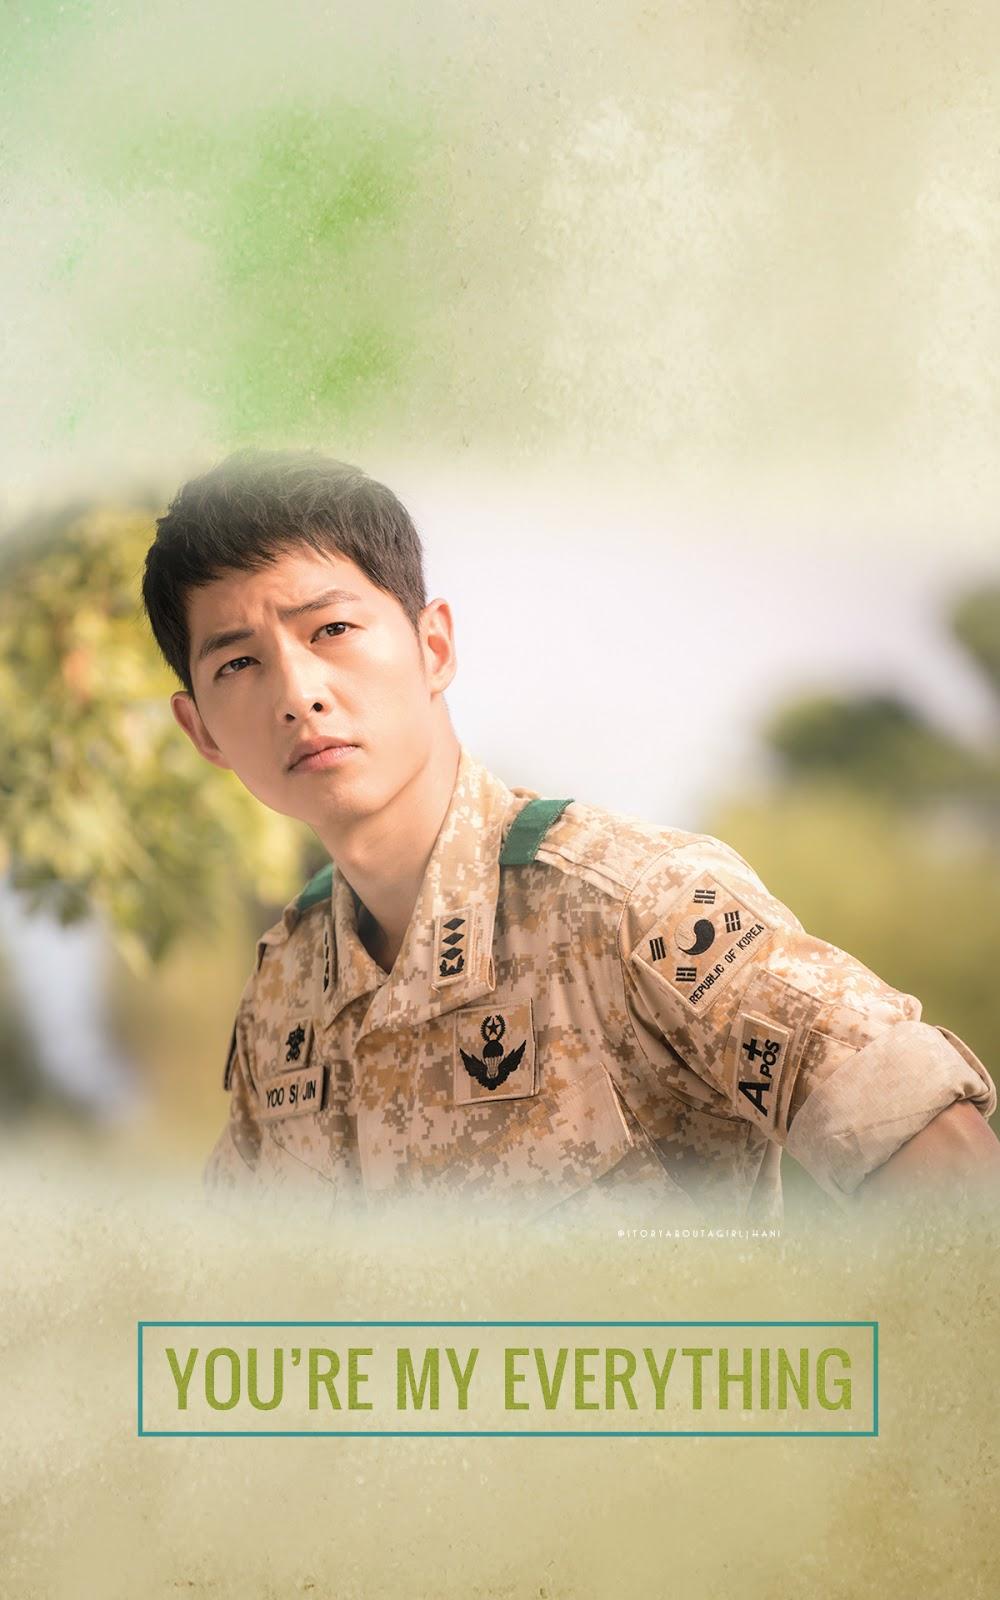 Descendants Of The Sun Wallpaper - Song Joong Ki Descendants Of The Sun - HD Wallpaper